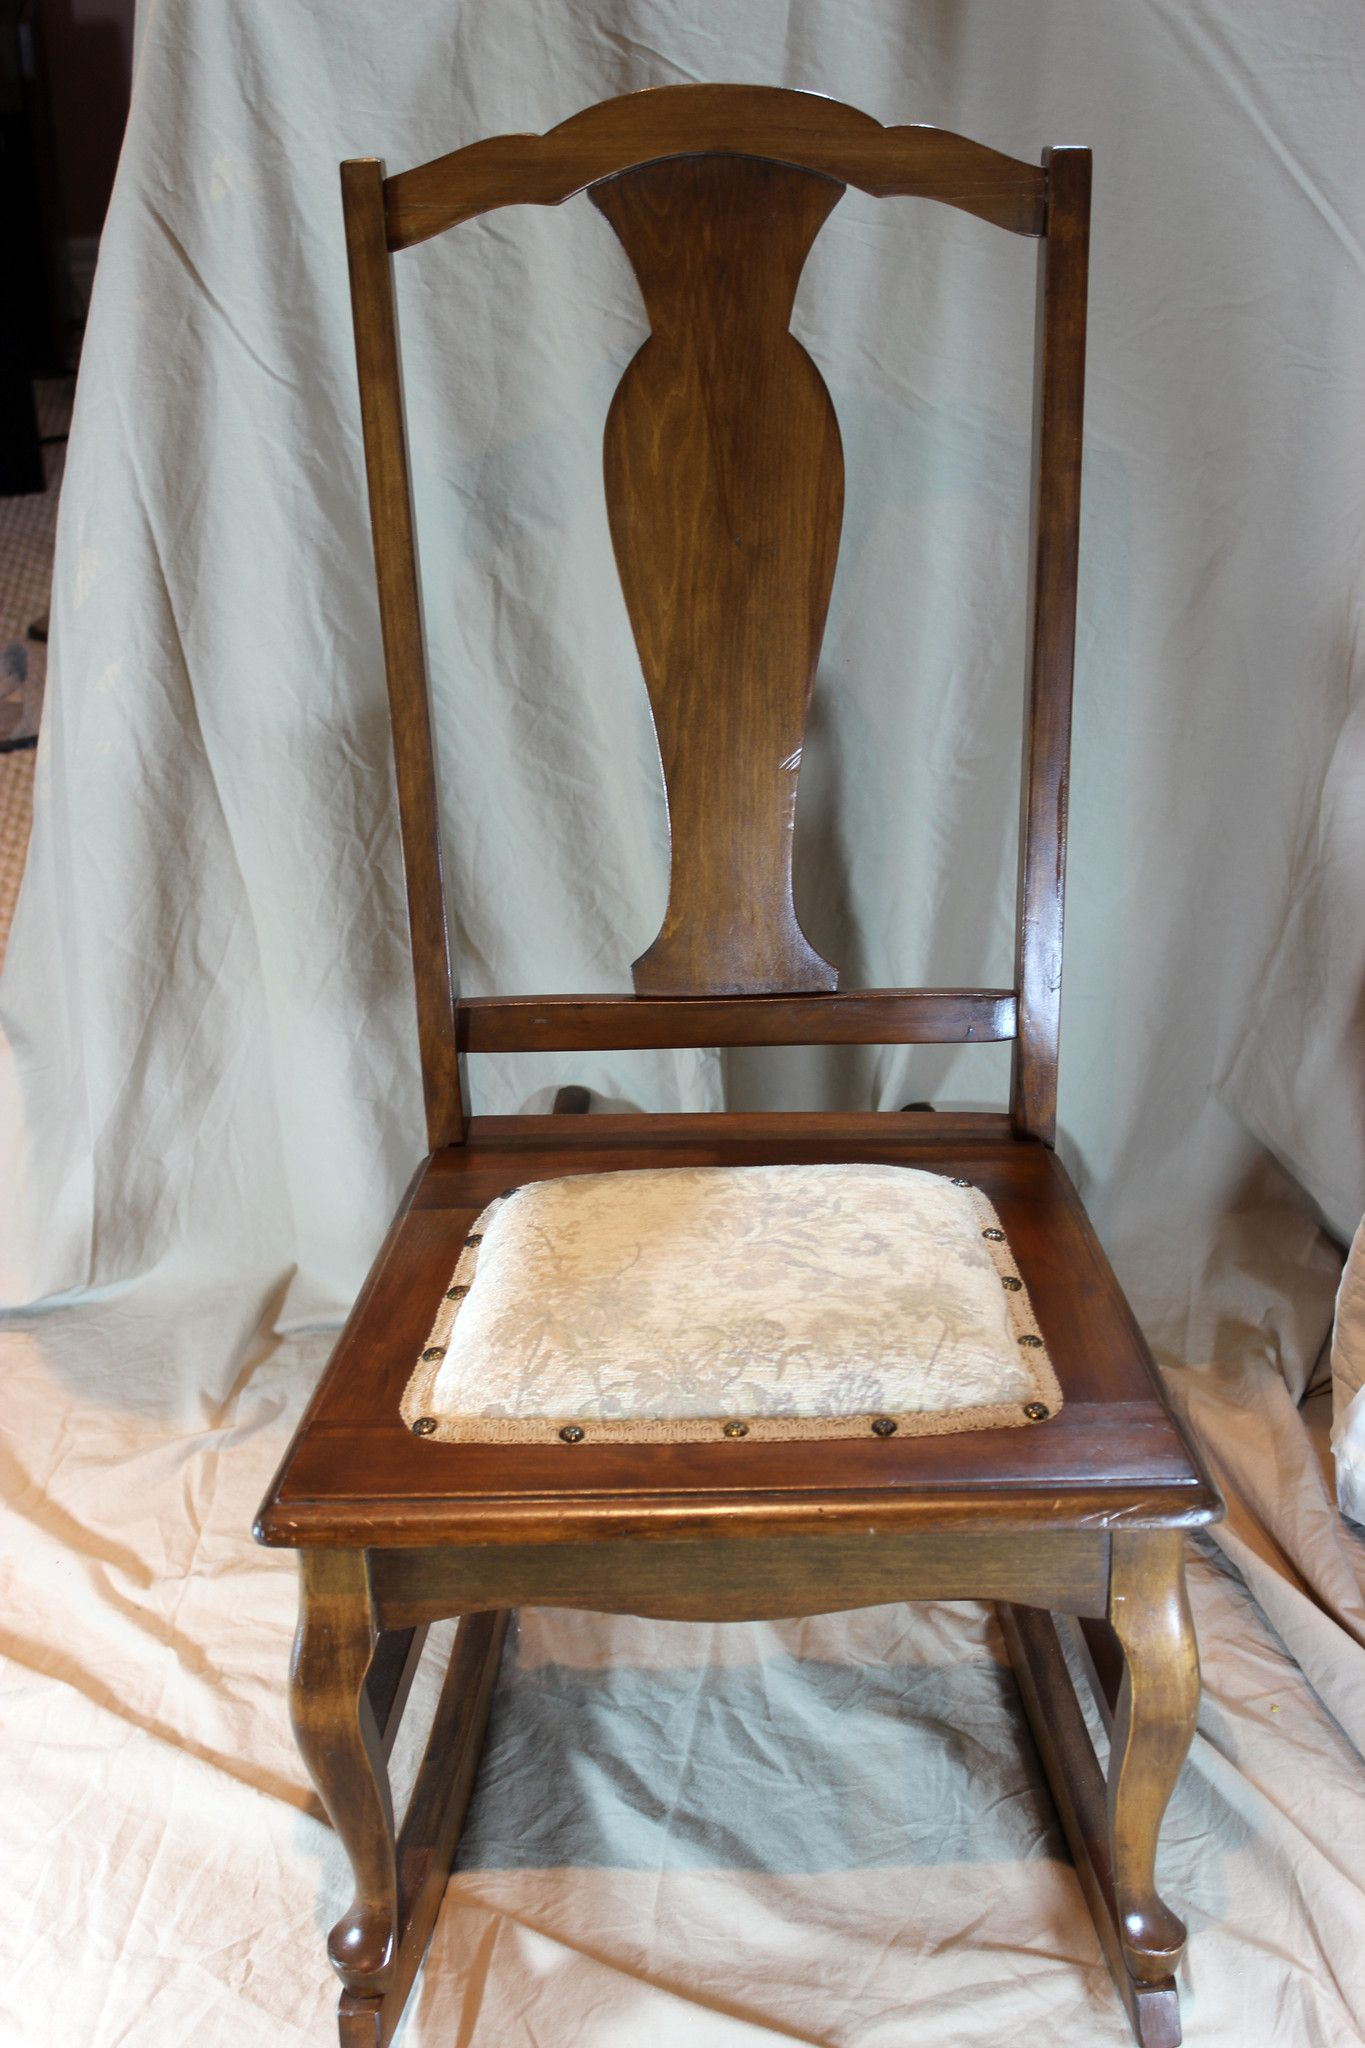 Small Antique Nursing/Sewing Rocker Circa1920's - Small Antique Nursing/Sewing Rocker Circa1920's Rockers